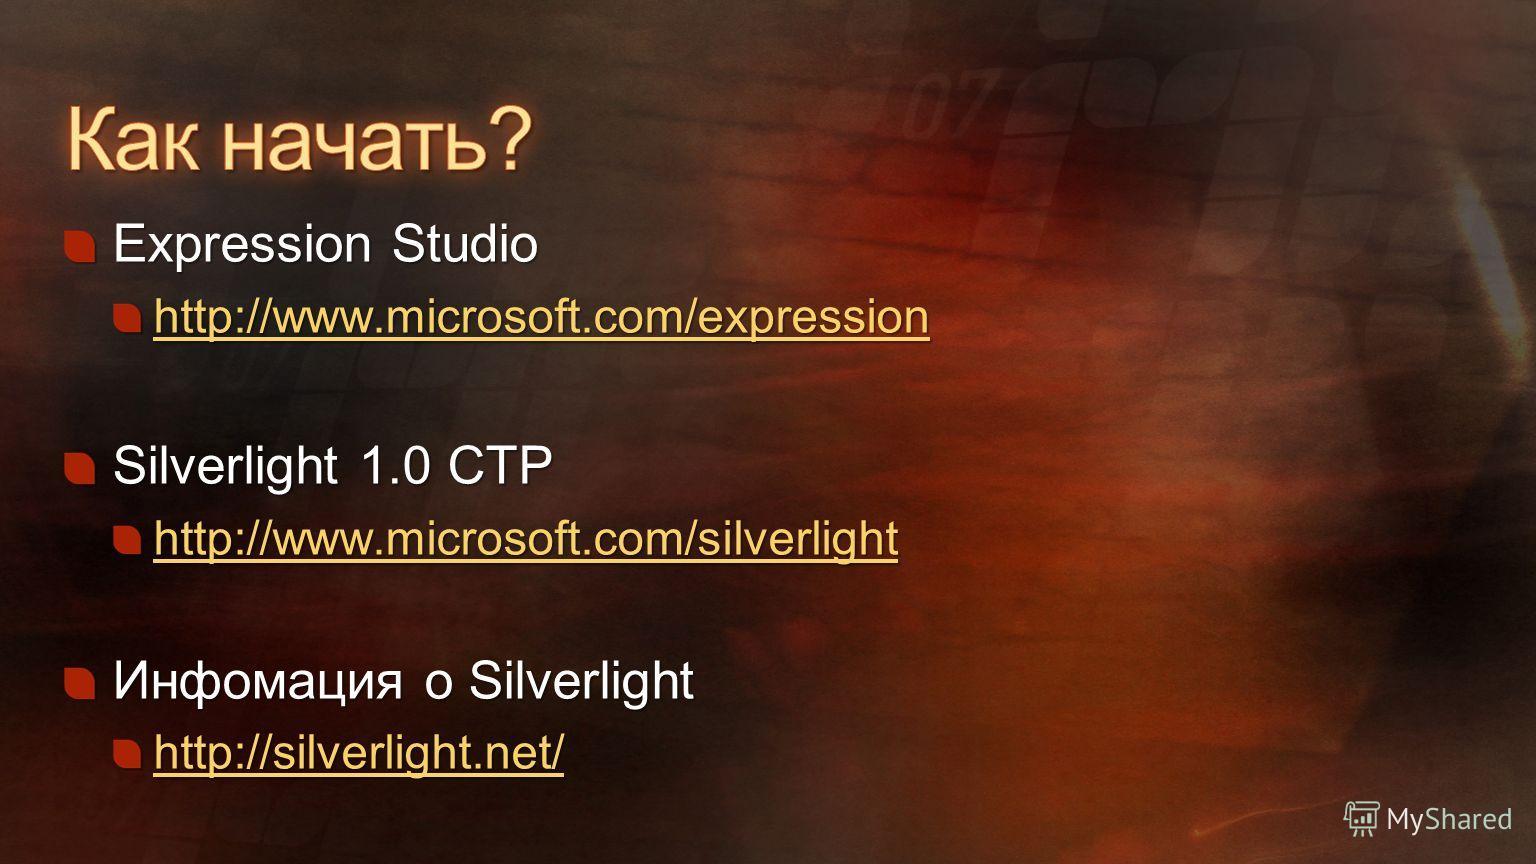 Expression Studio http://www.microsoft.com/expression Silverlight 1.0 CTP http://www.microsoft.com/silverlight Инфомация о Silverlight http://silverlight.net/